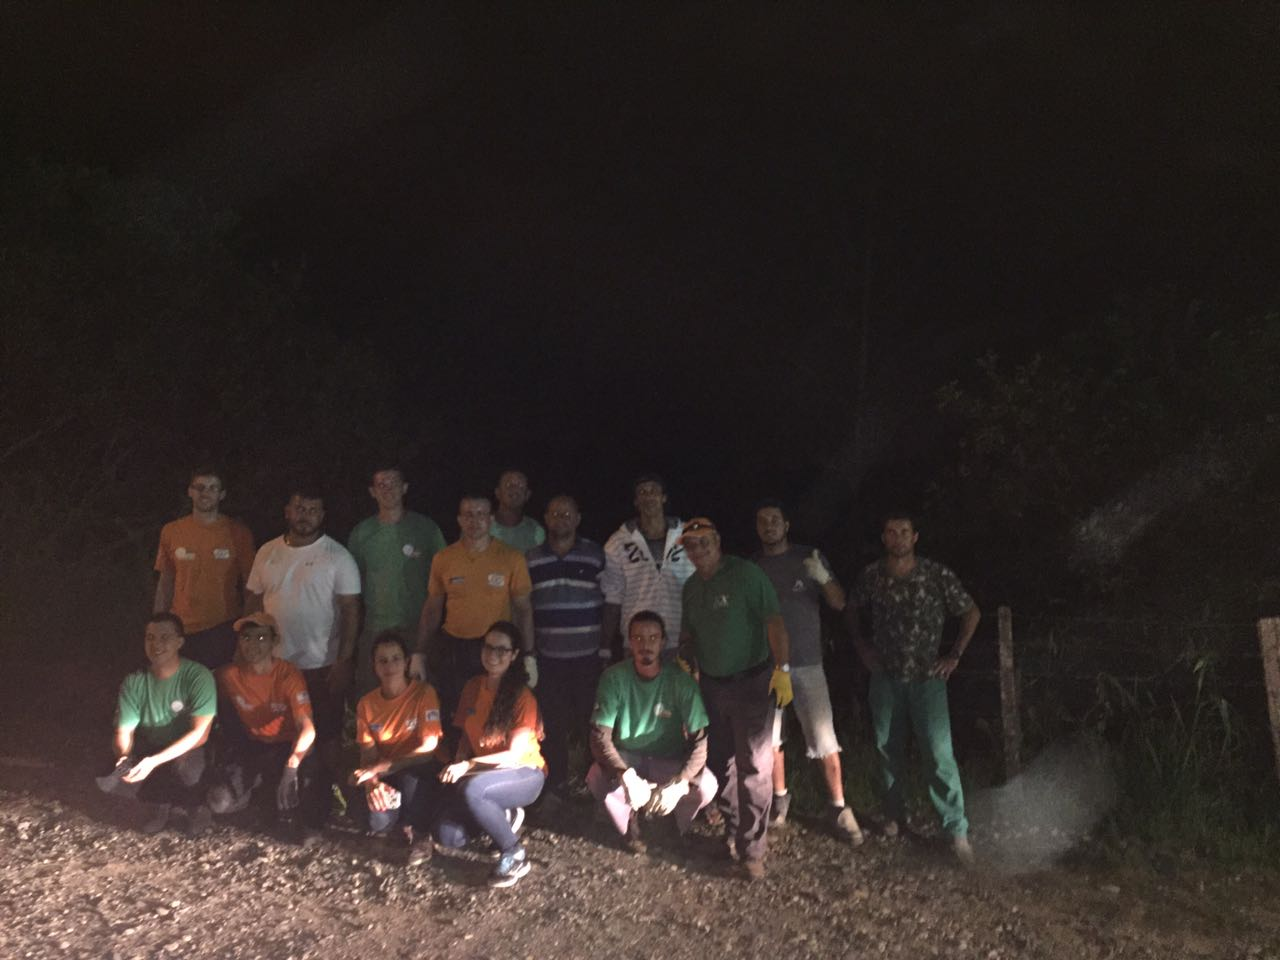 Prefeito Gean coordena força-tarefa para a entrega de telhas no Norte da Ilha